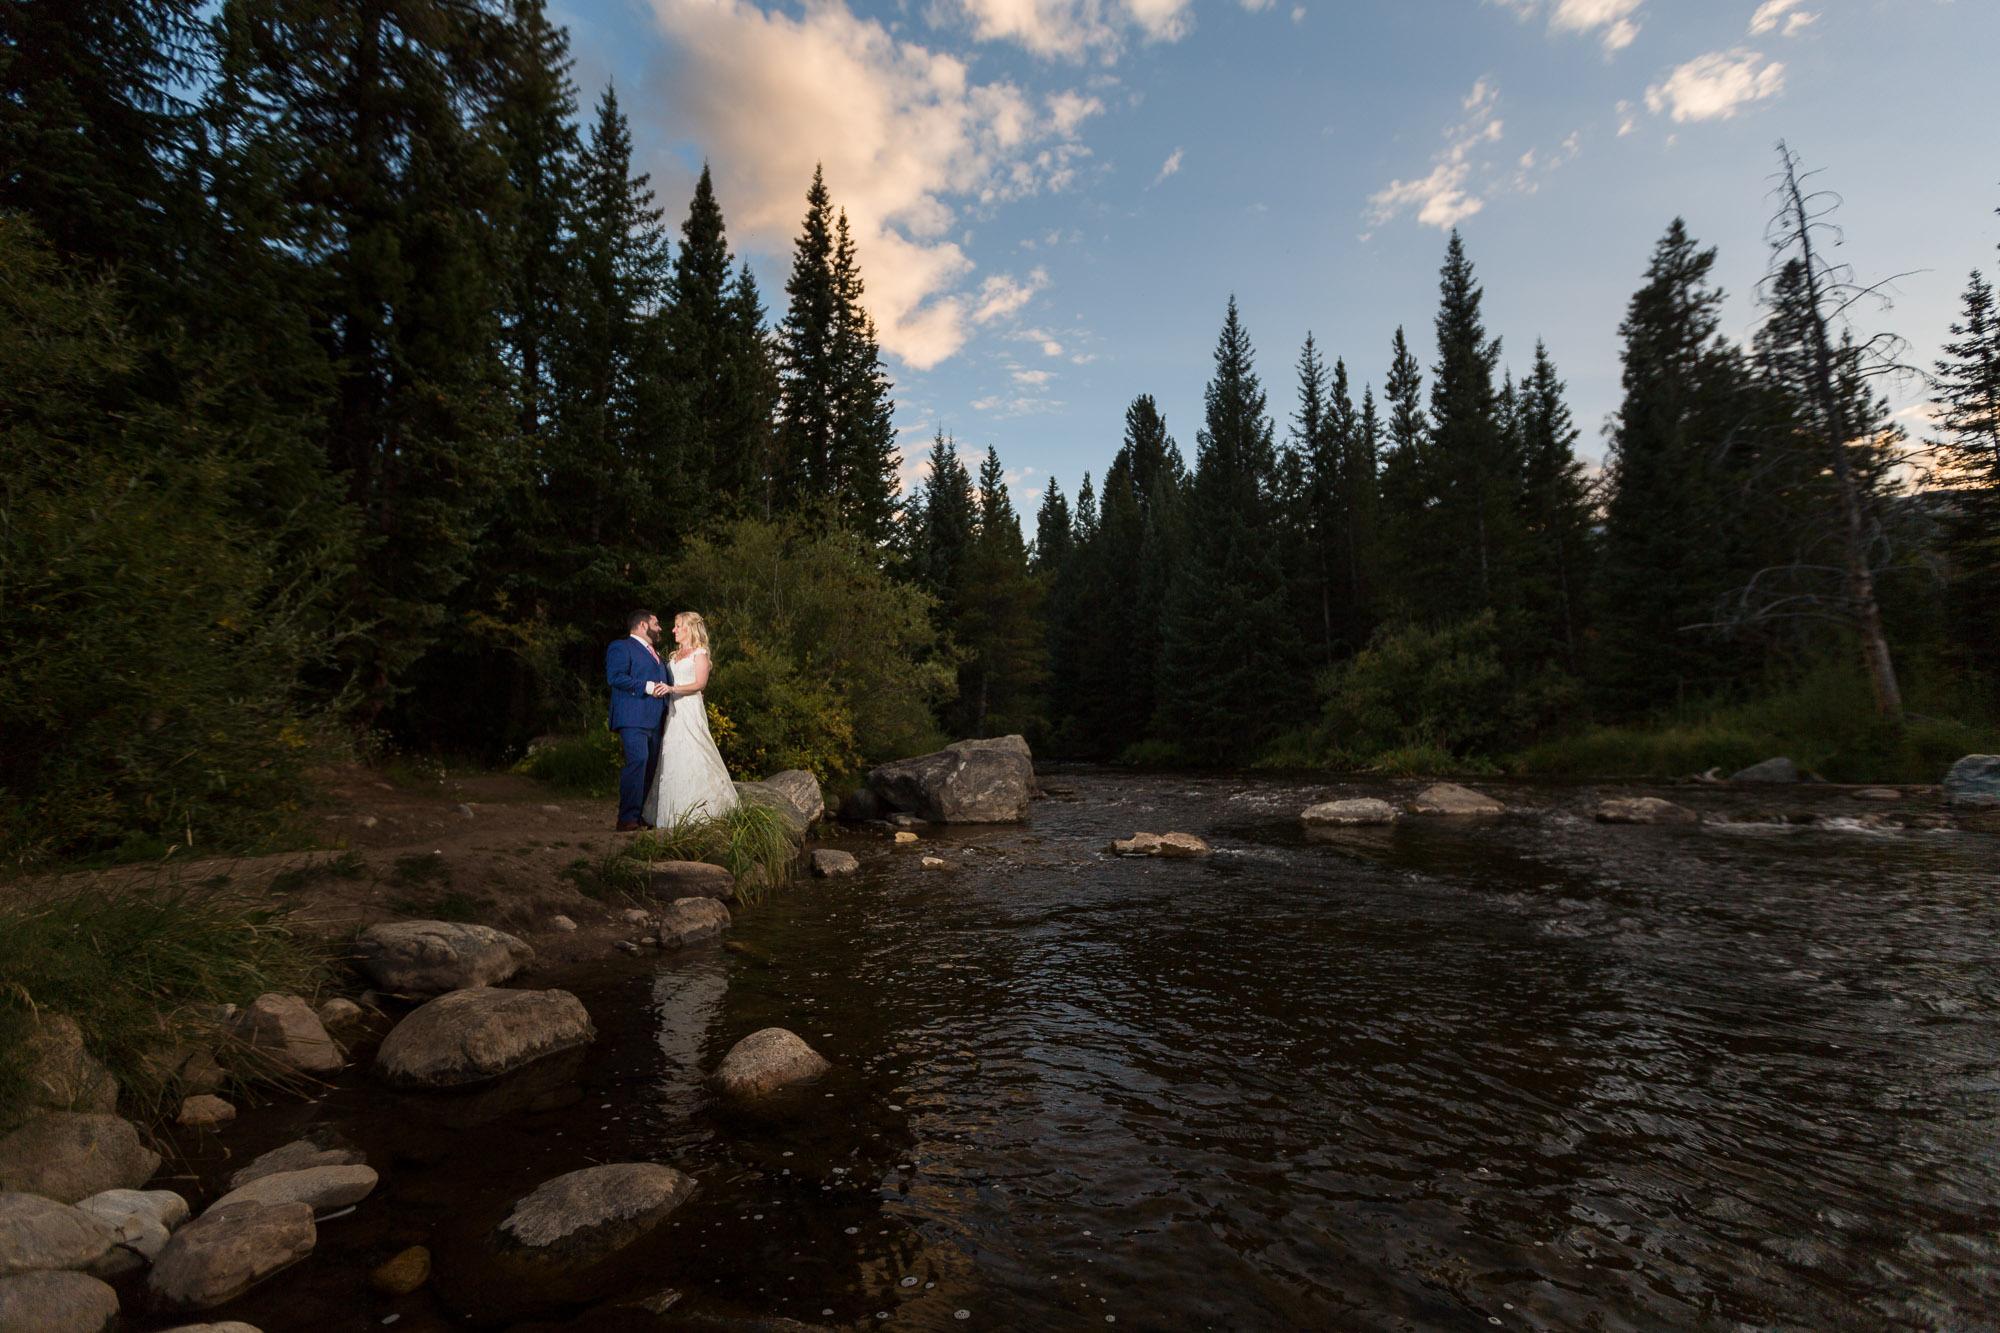 Main Street Station Breckenridge, Colorado Wedding -- Gorgeous Wedding Photos - The Overwhelmed Bride